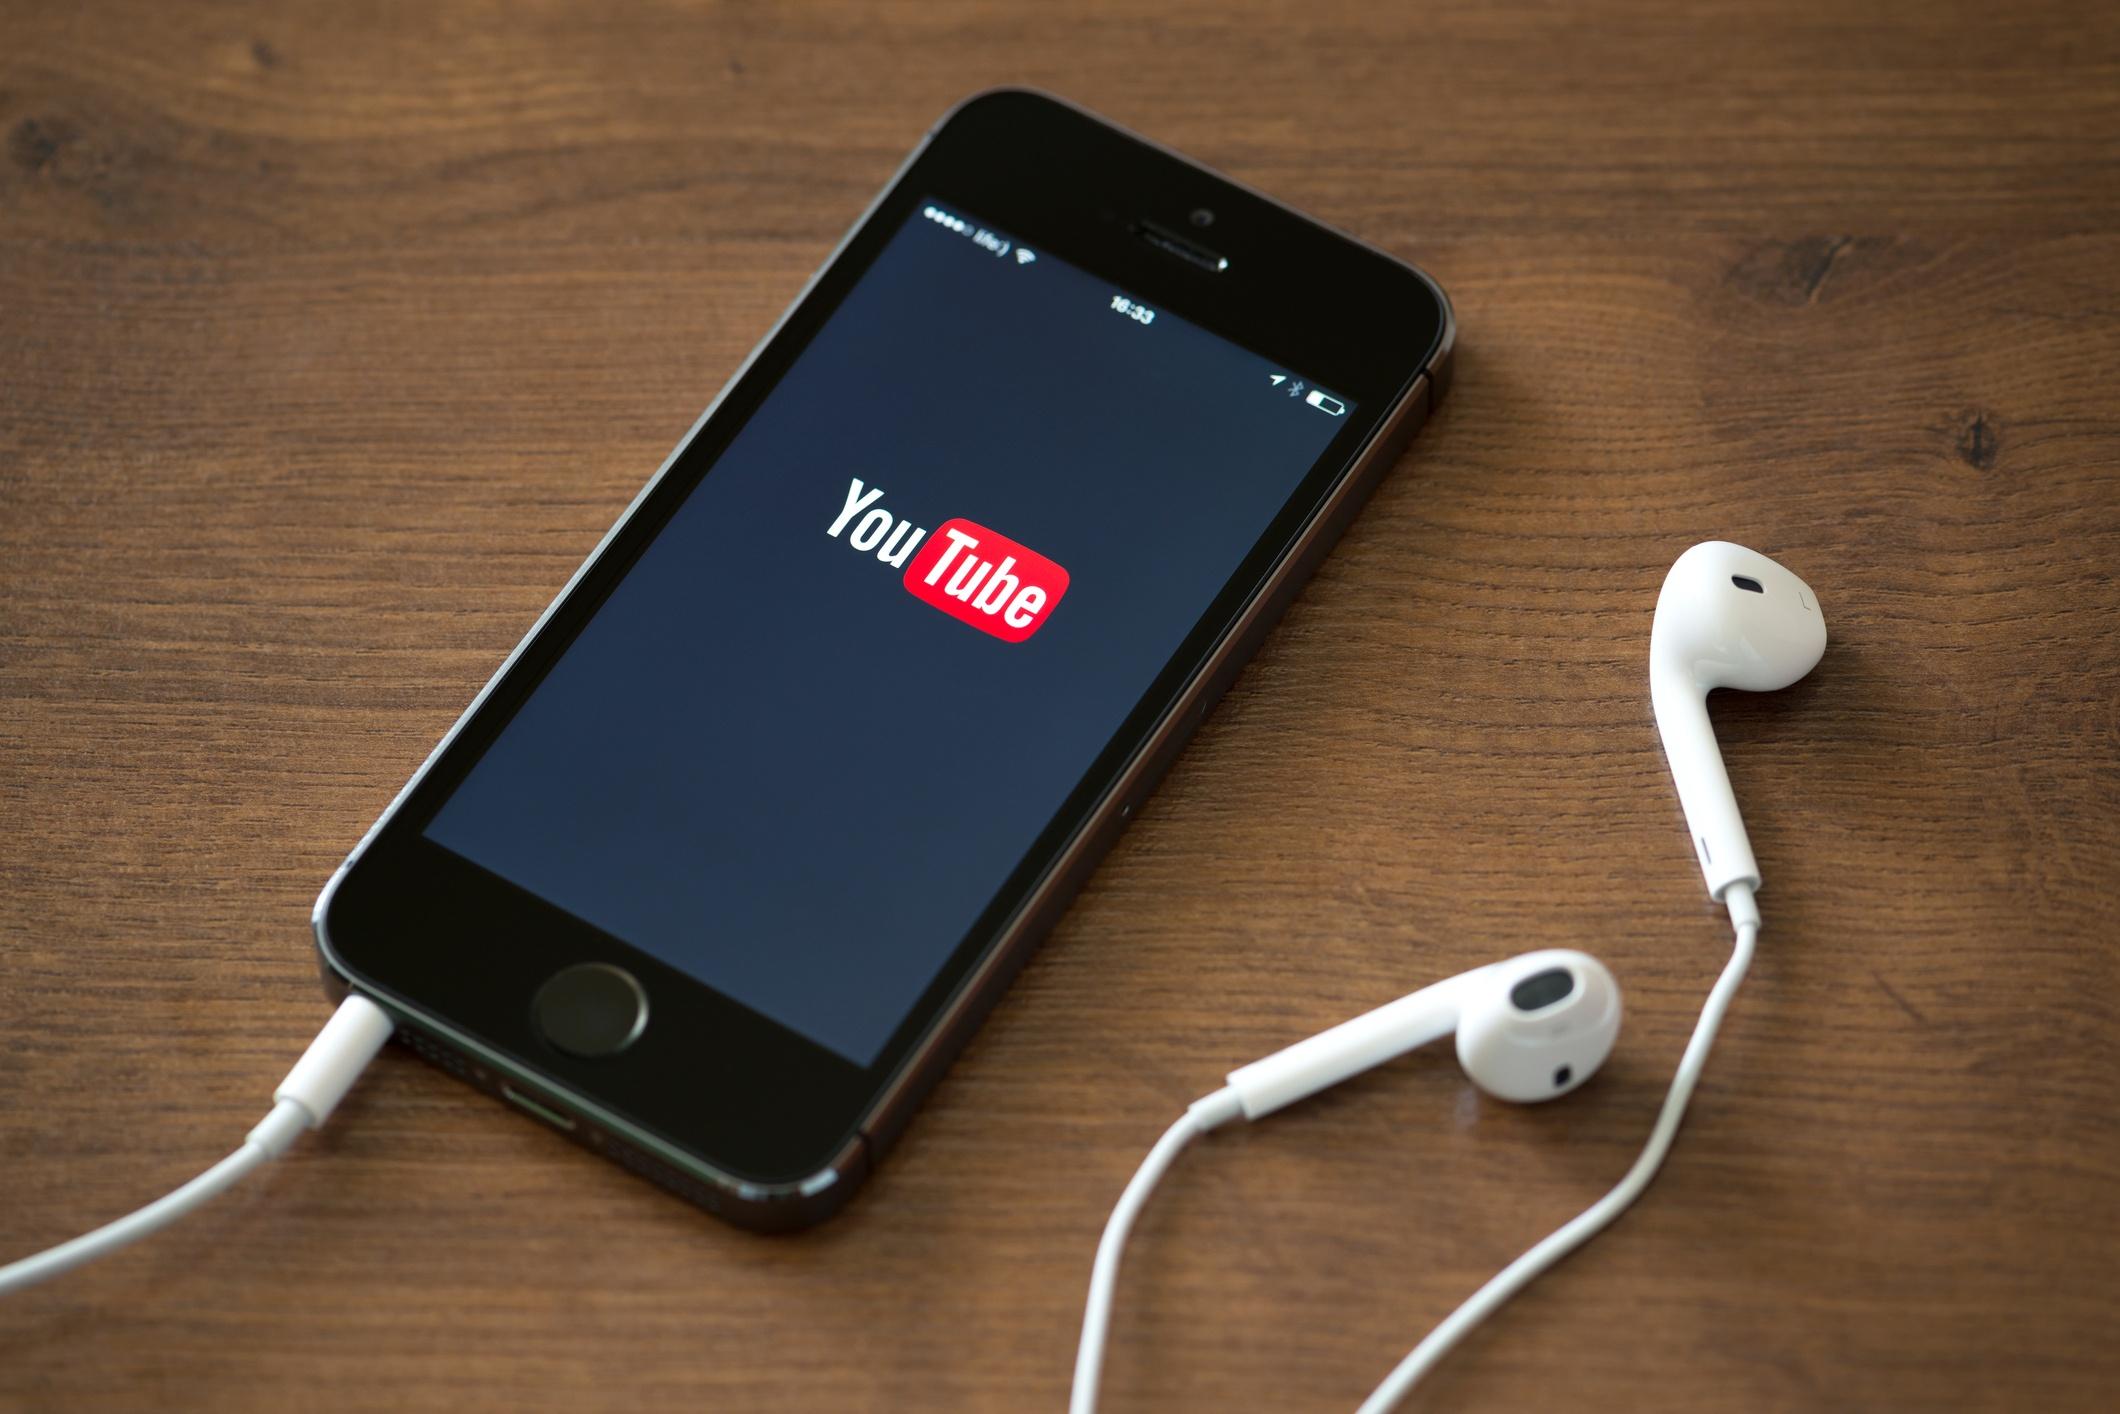 Youtube on iPhone.jpg